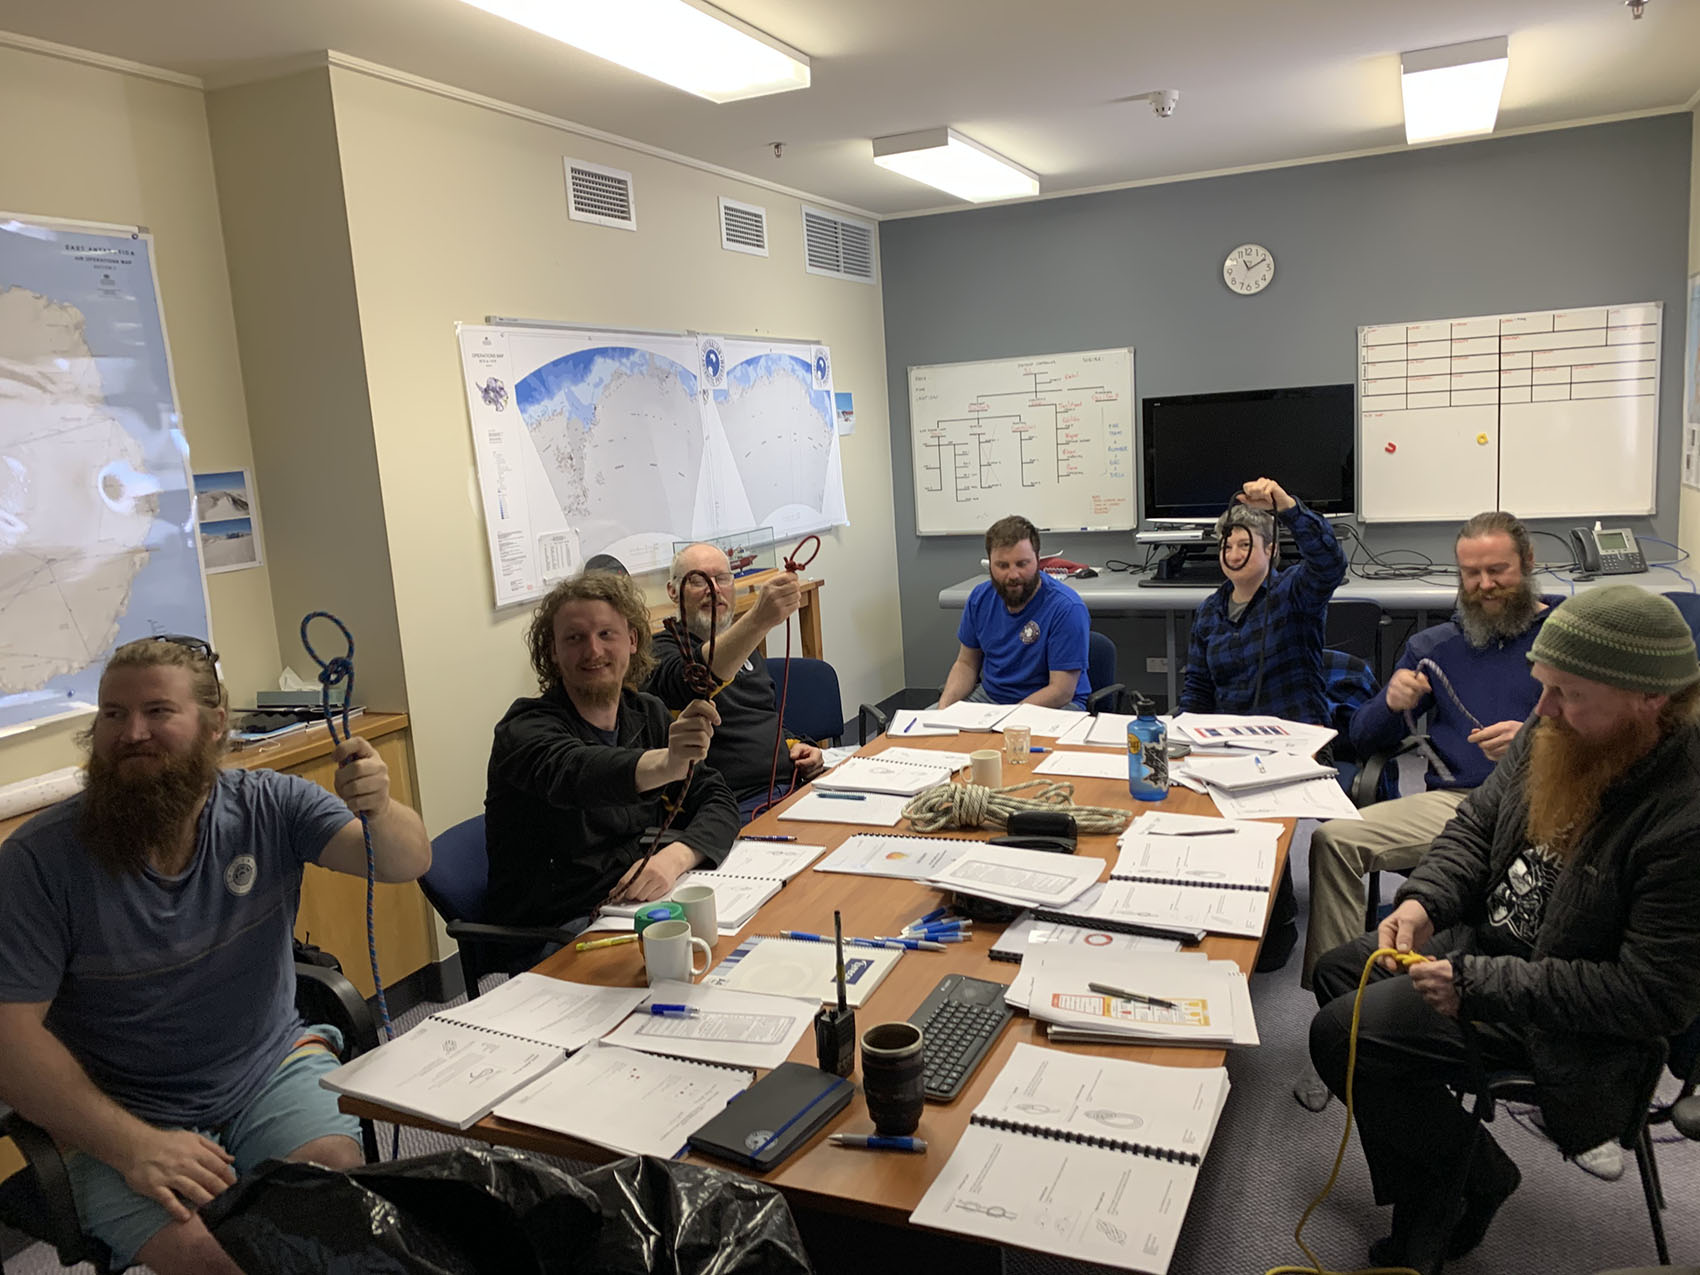 smt-online-training-hobart-davis-station-antarctica